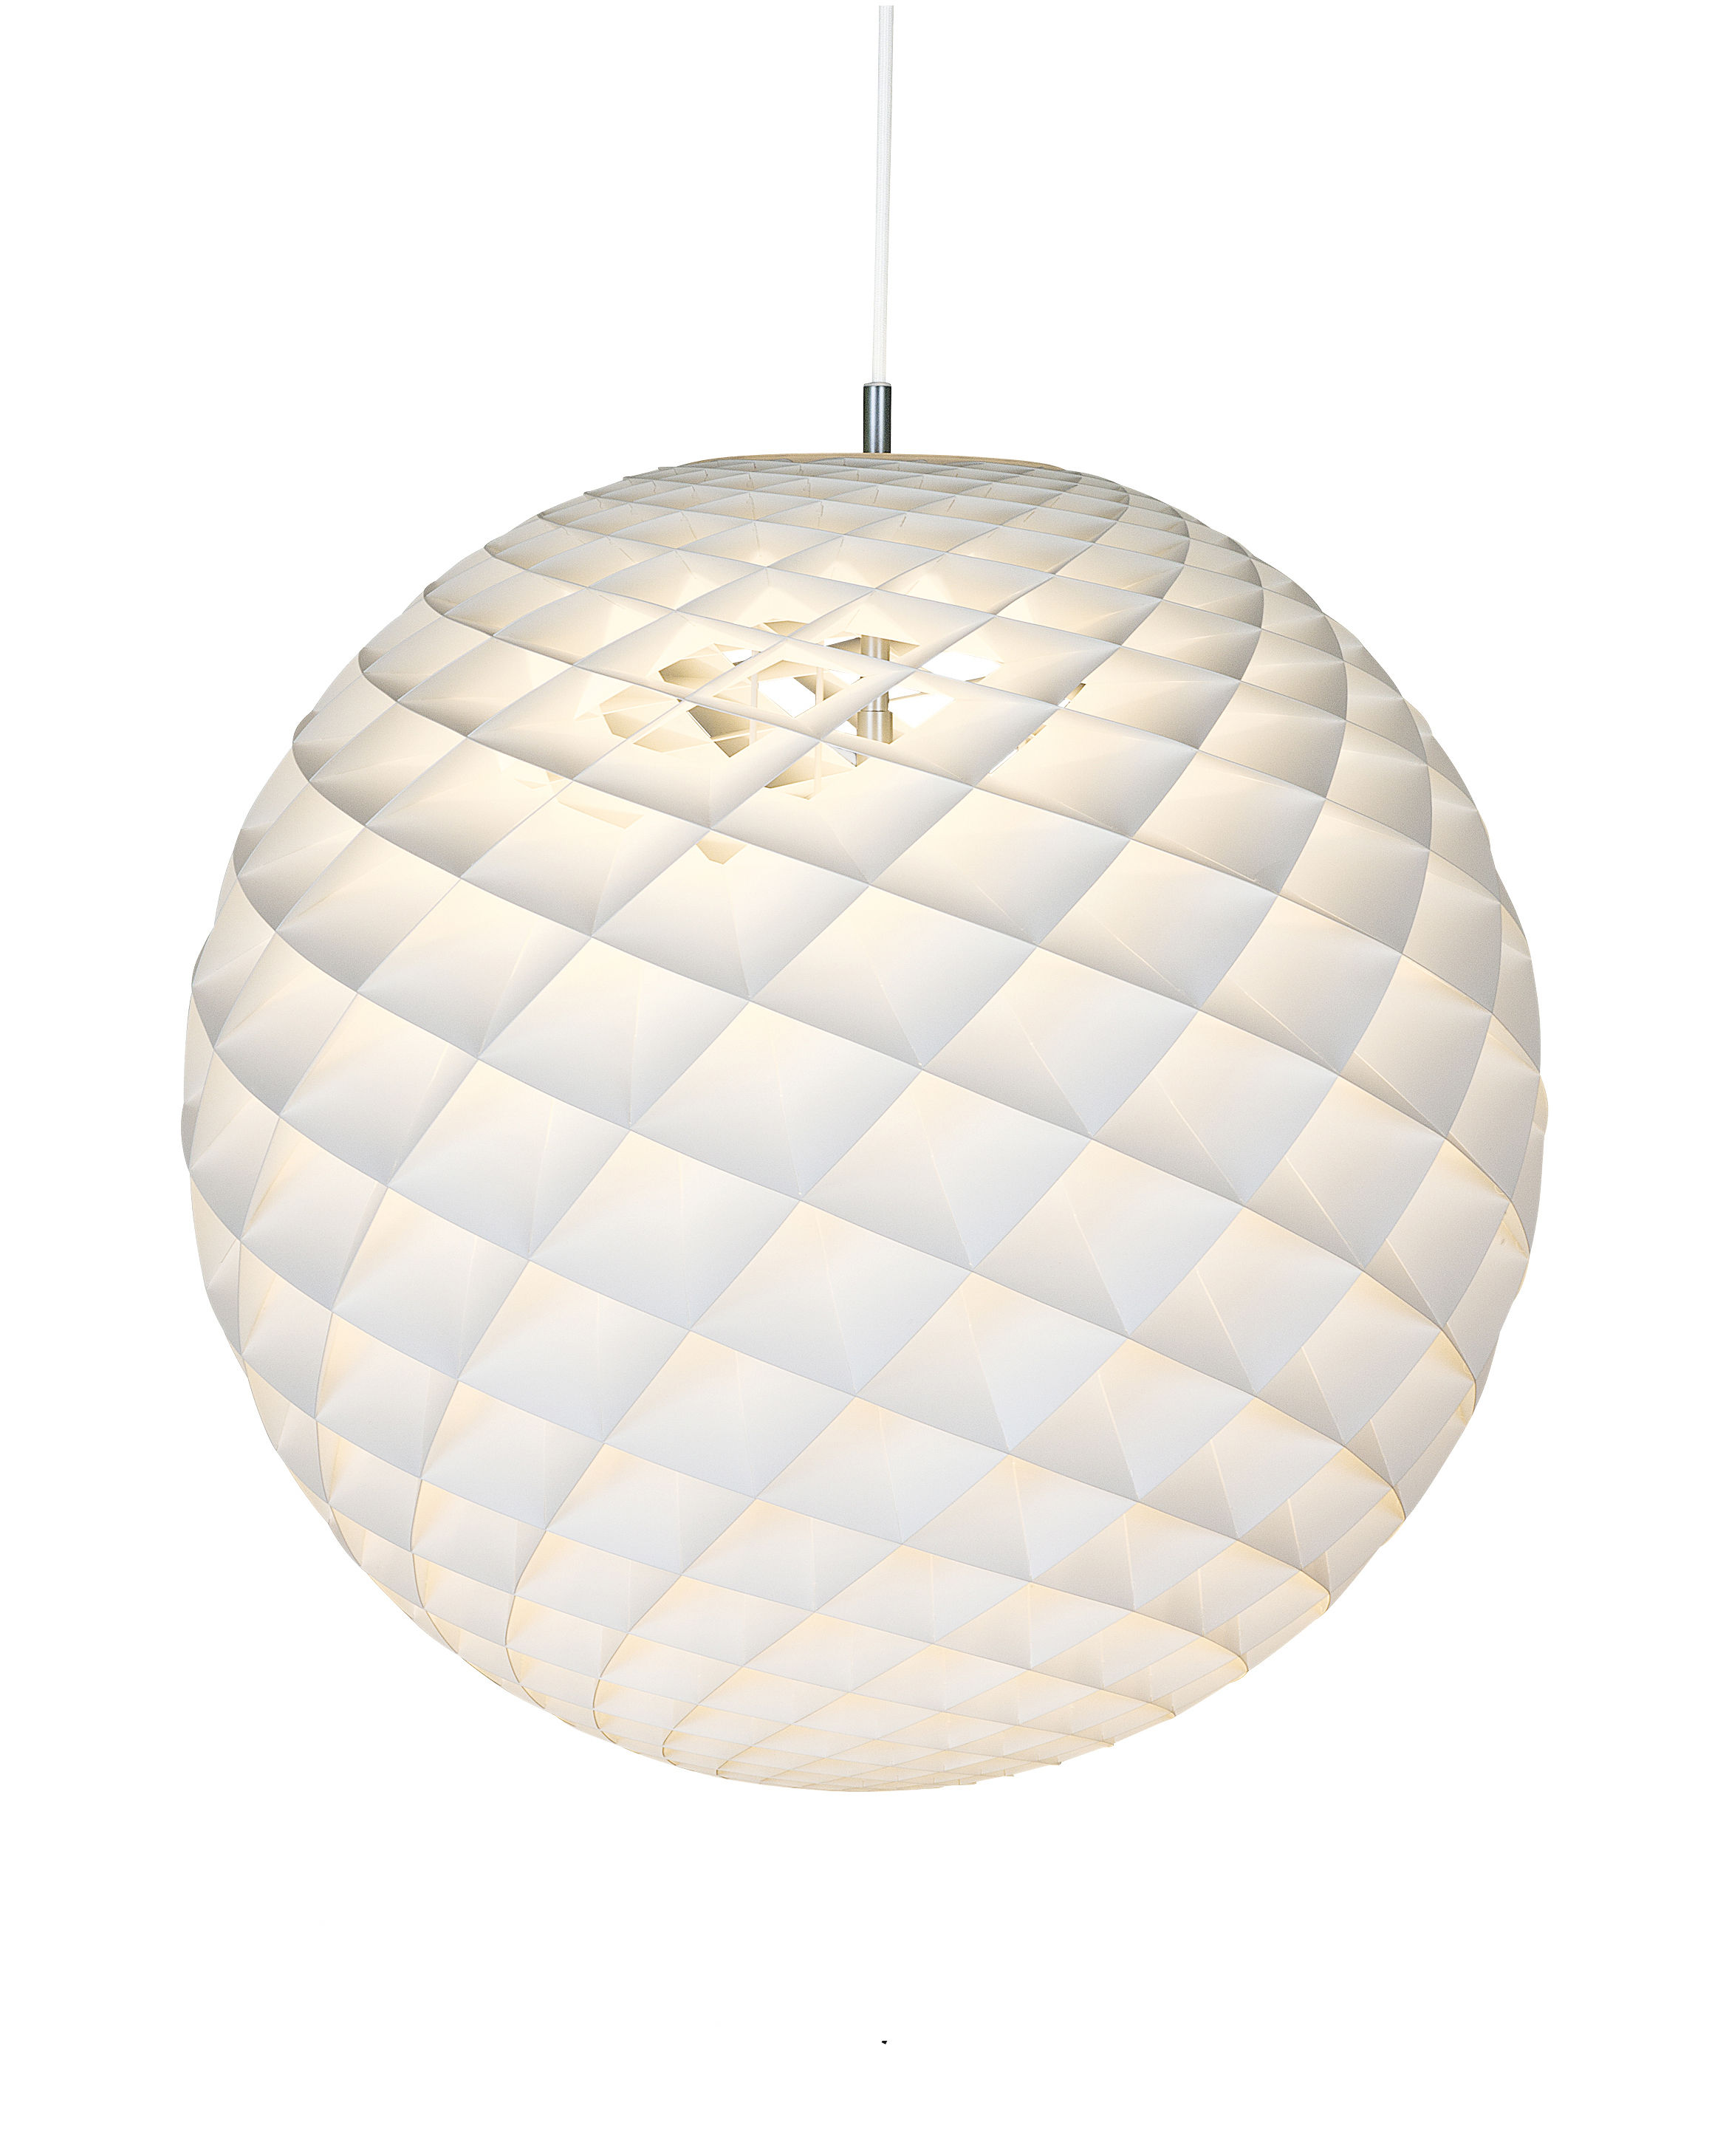 Lighting - Pendant Lighting - Patera Pendant - Ø 60 cm by Louis Poulsen - White - Acrylic, Brass, PVC